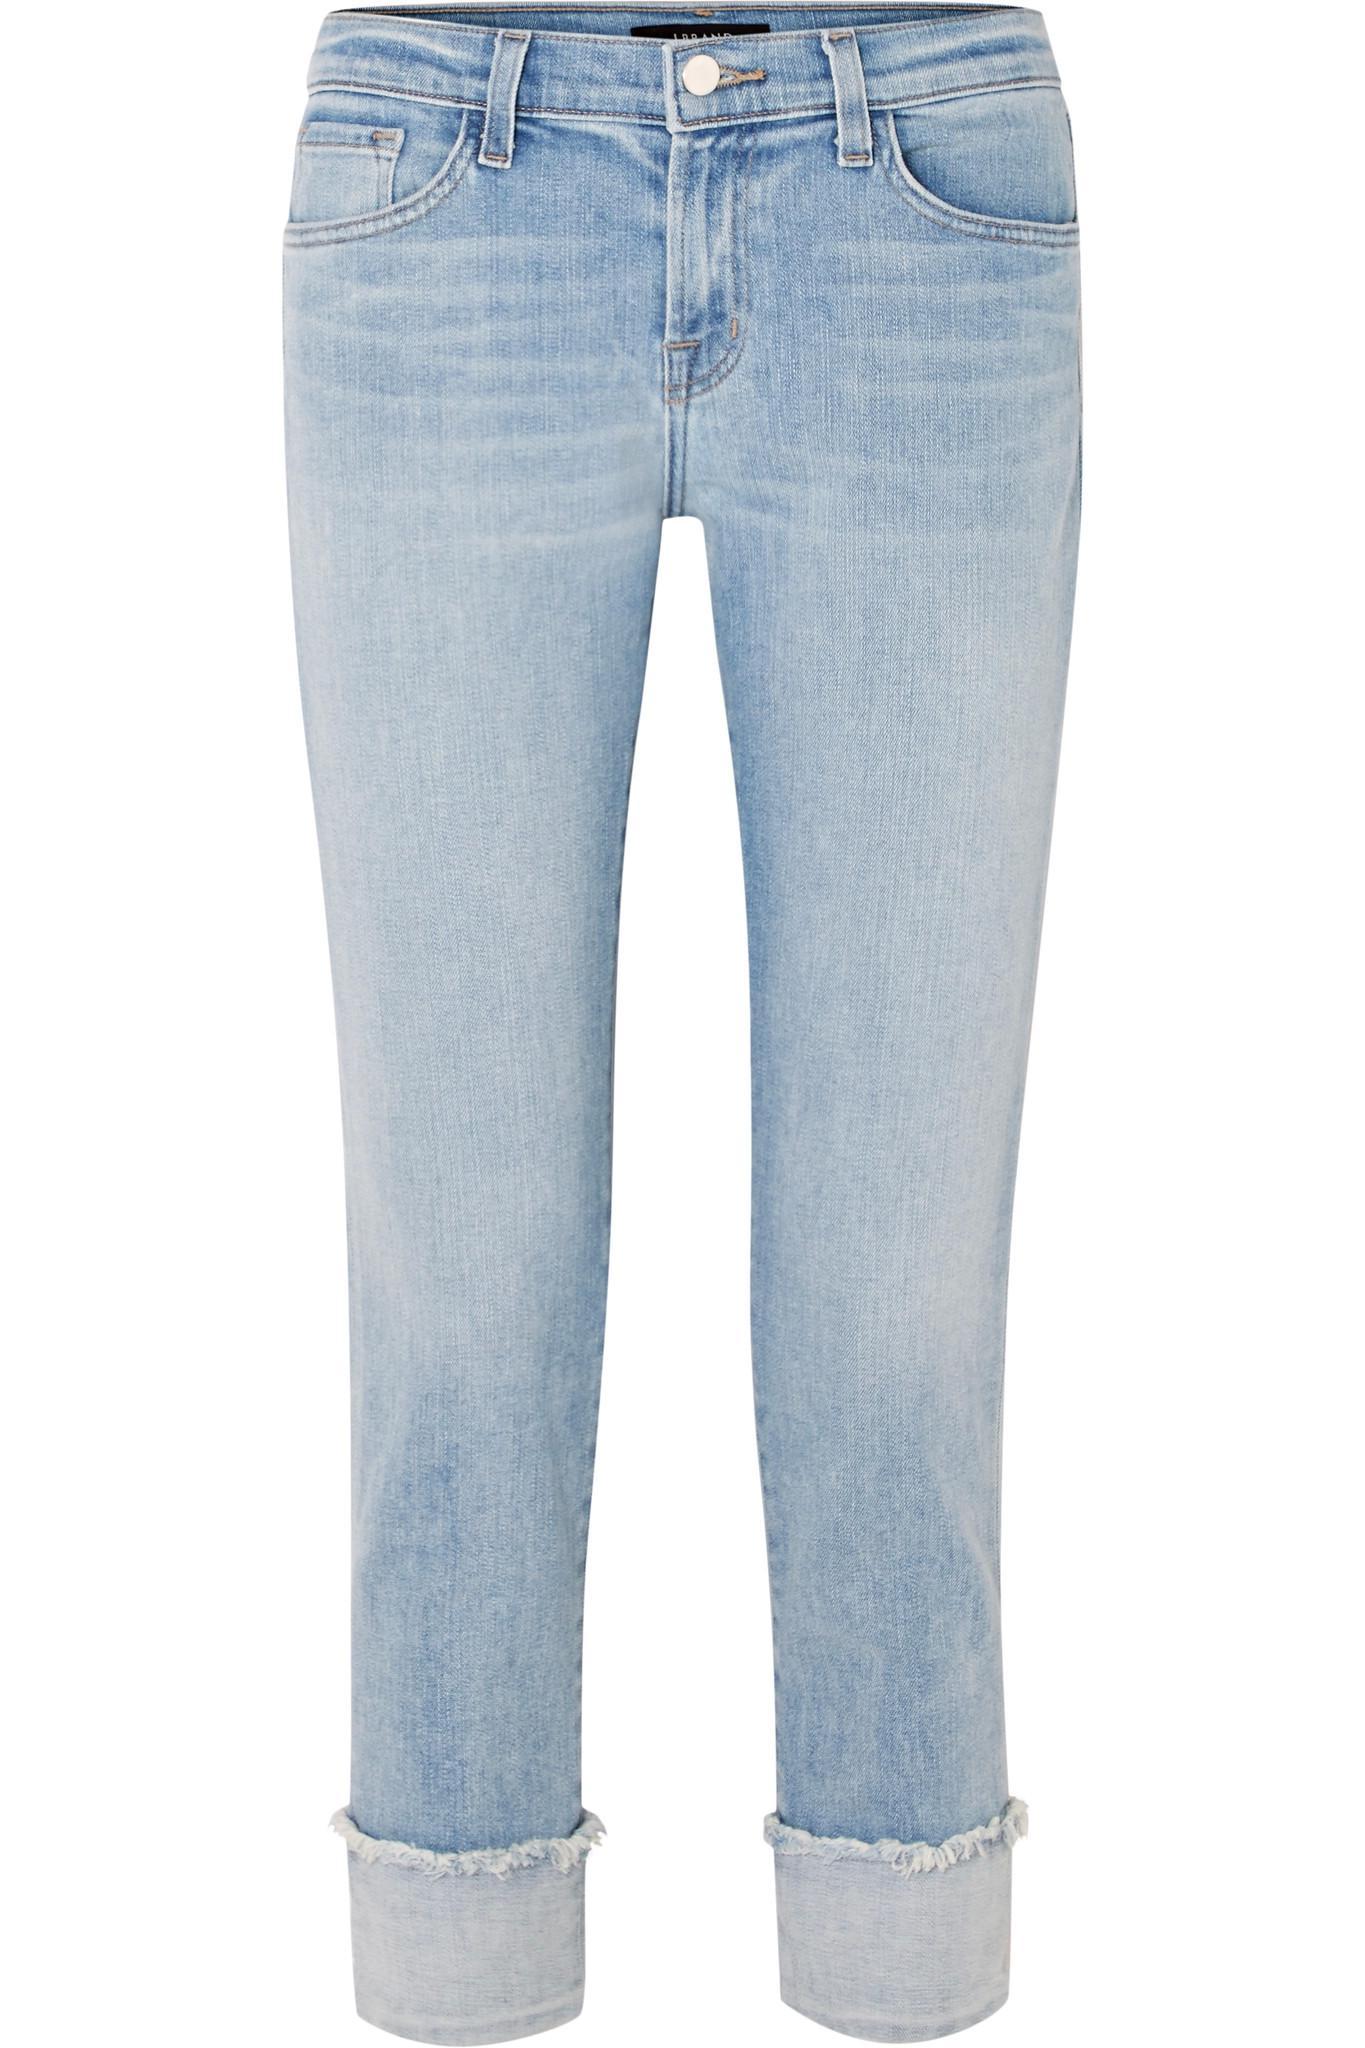 Sadey Mid-rise Slim-leg Jeans - Light denim J Brand Outlet Sneakernews S39M2B